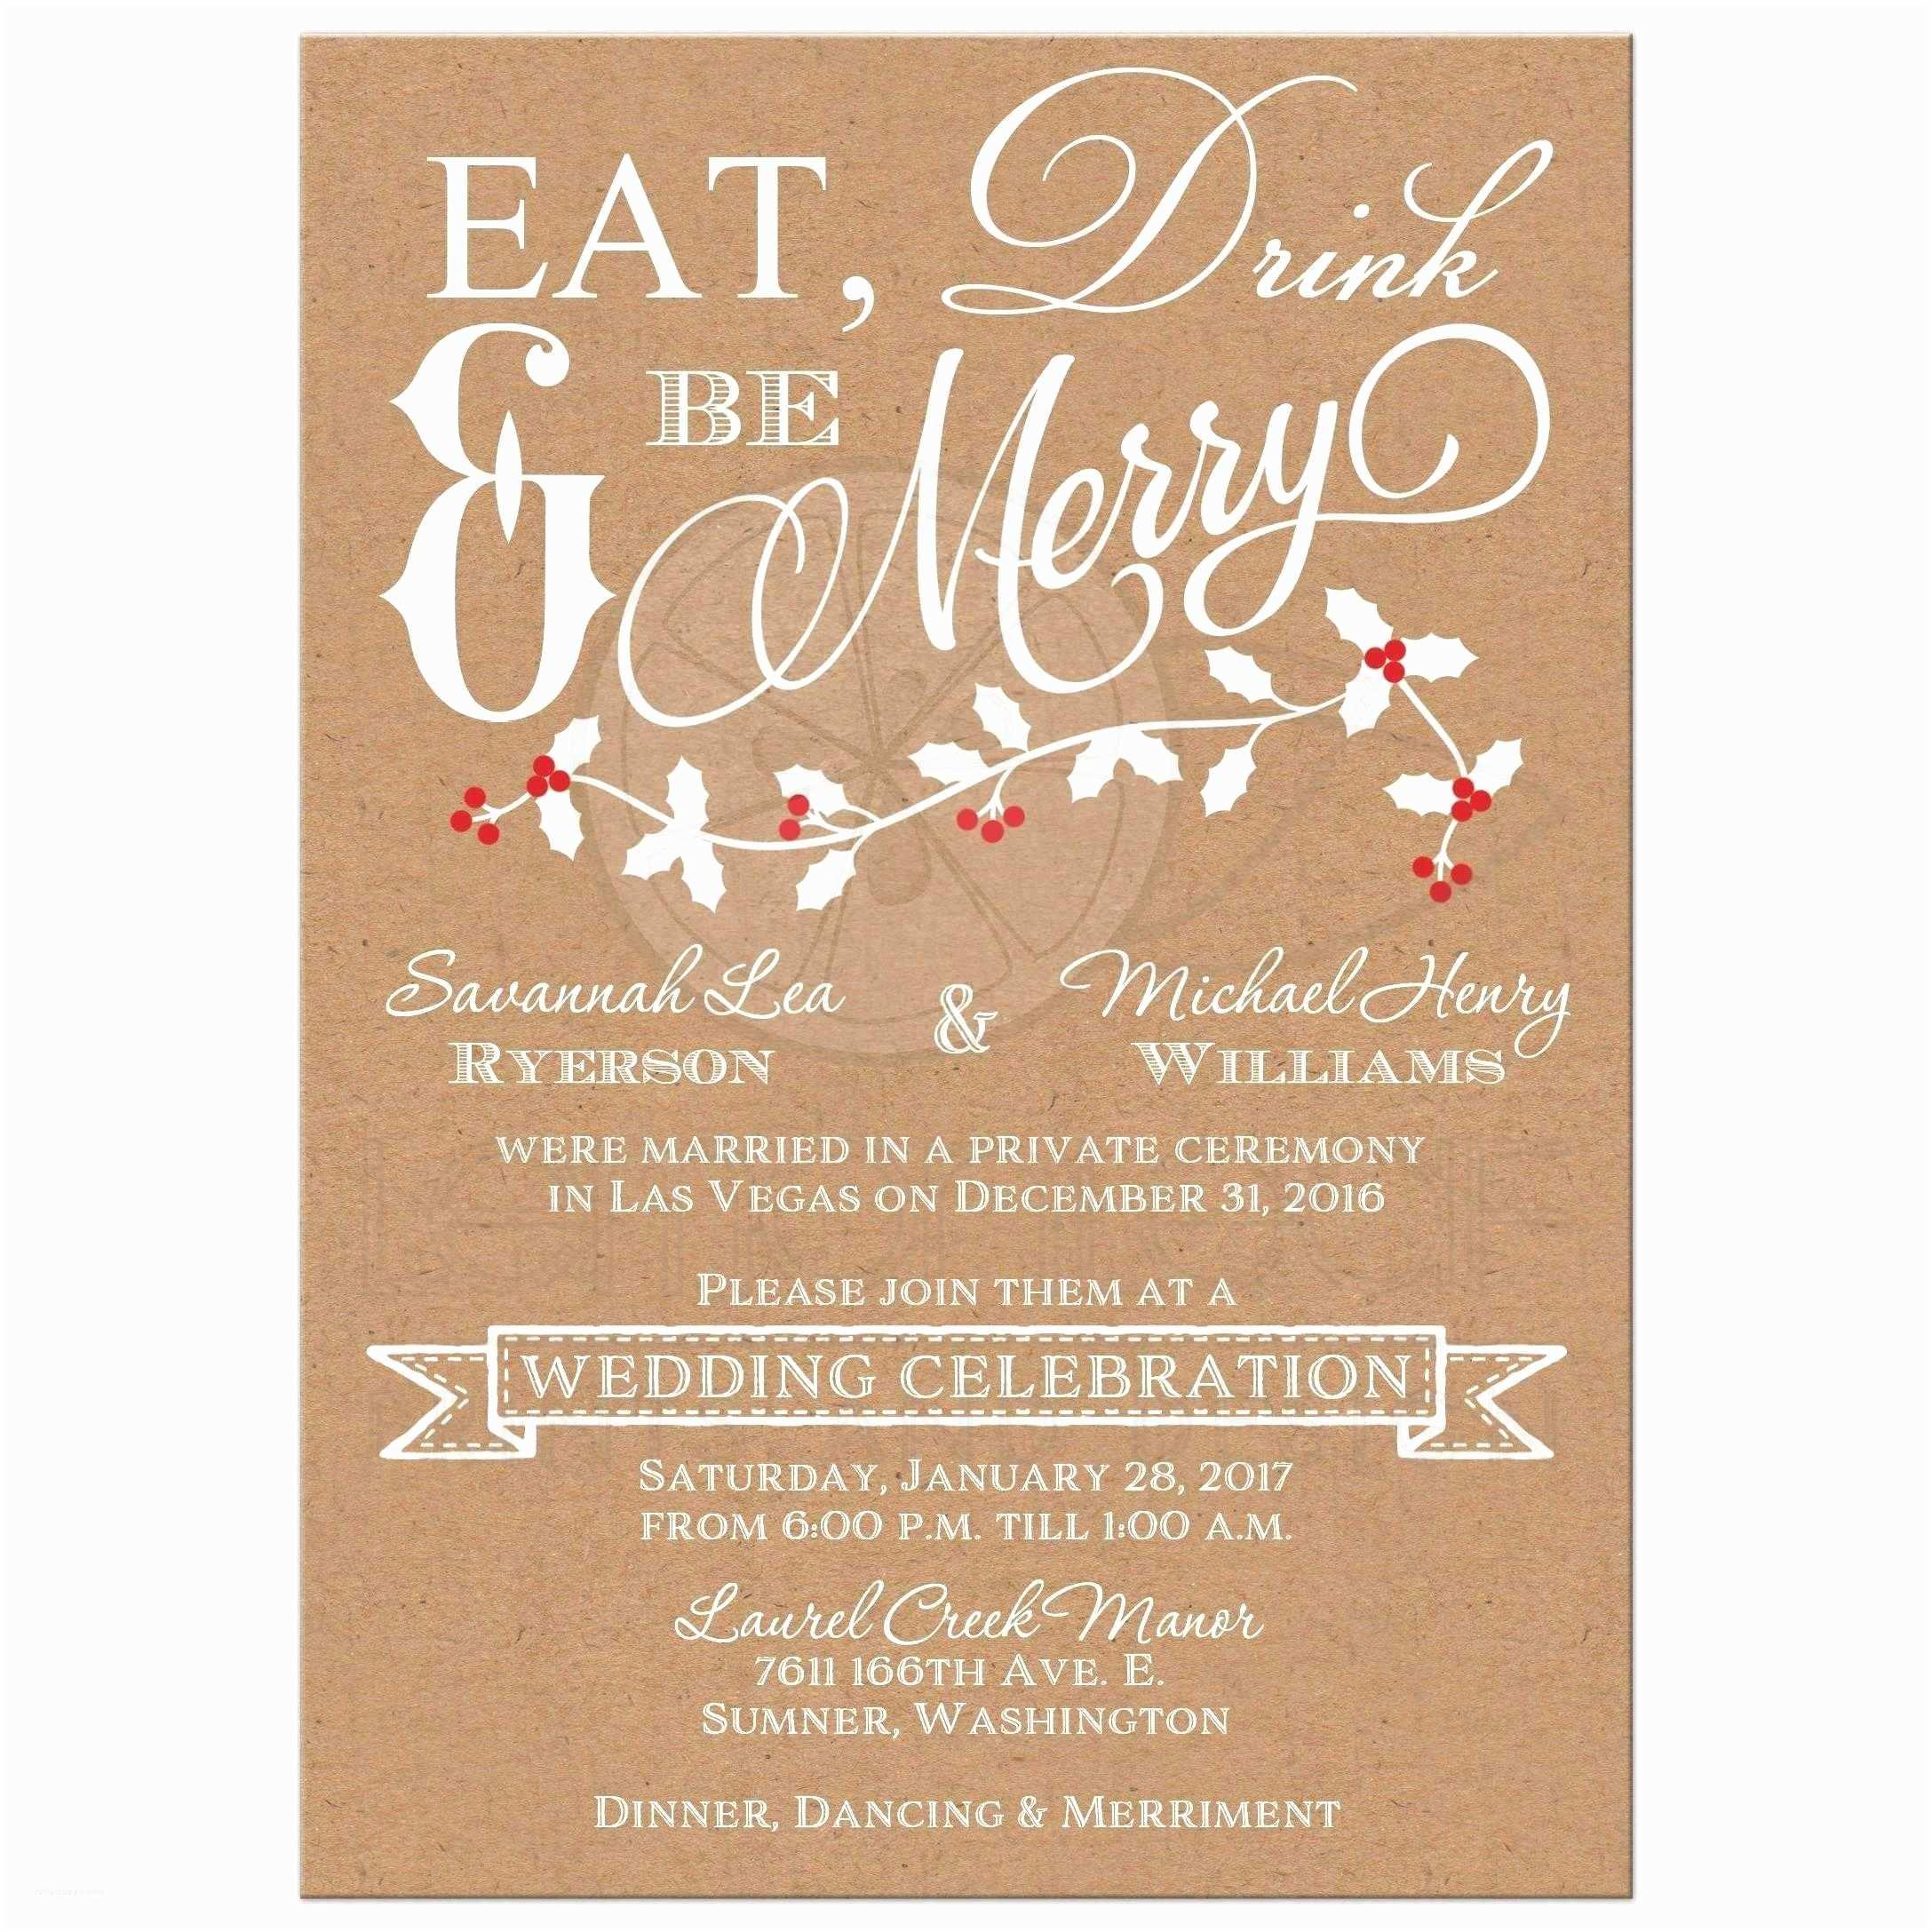 Reception Invites after Destination Wedding Invitation Wording for Party after Destination Wedding Bes